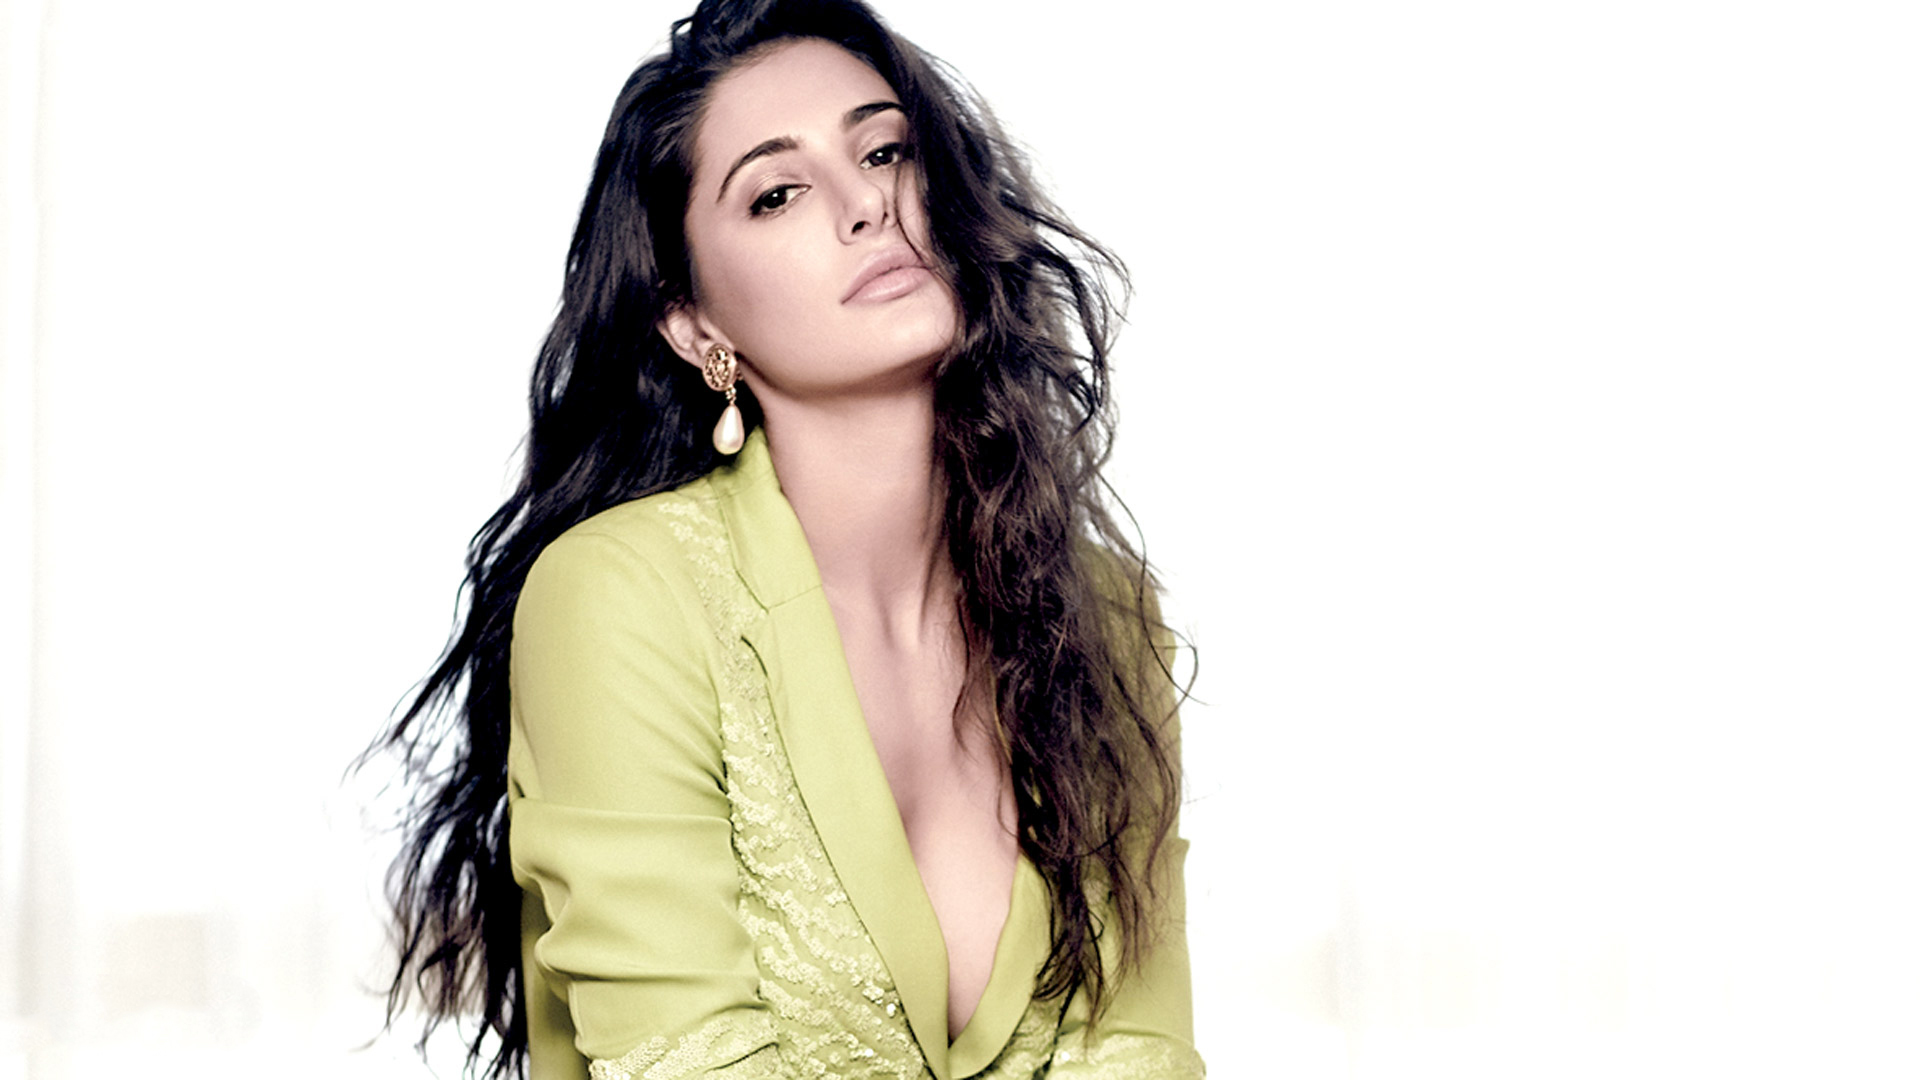 Celebrities Hd Wallpaper Download Nargis Fakhri Hd: Nargis Fakhri Latest Unseen Cleavage HD Wallpapers